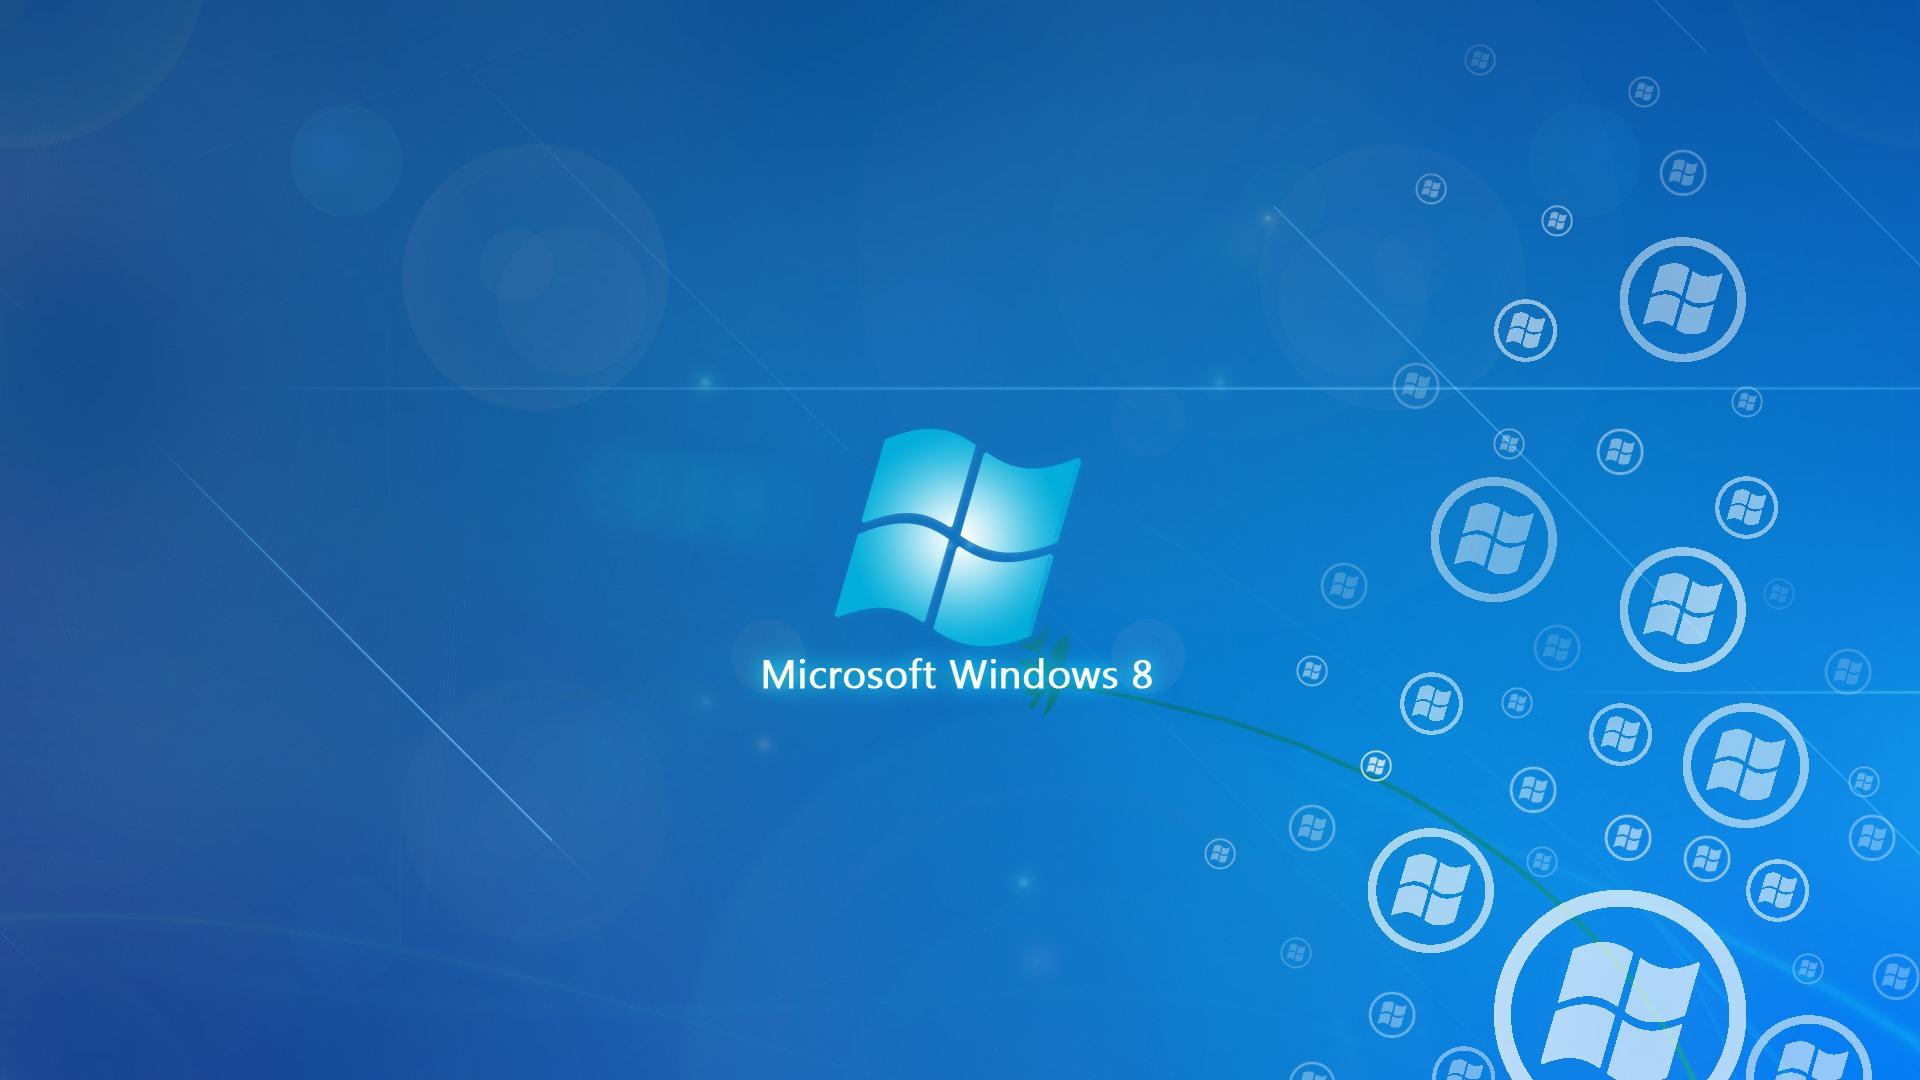 Great Wallpaper High Quality Windows 8 - windows-8-wallpaper-themes-6  Pic_866480.jpg